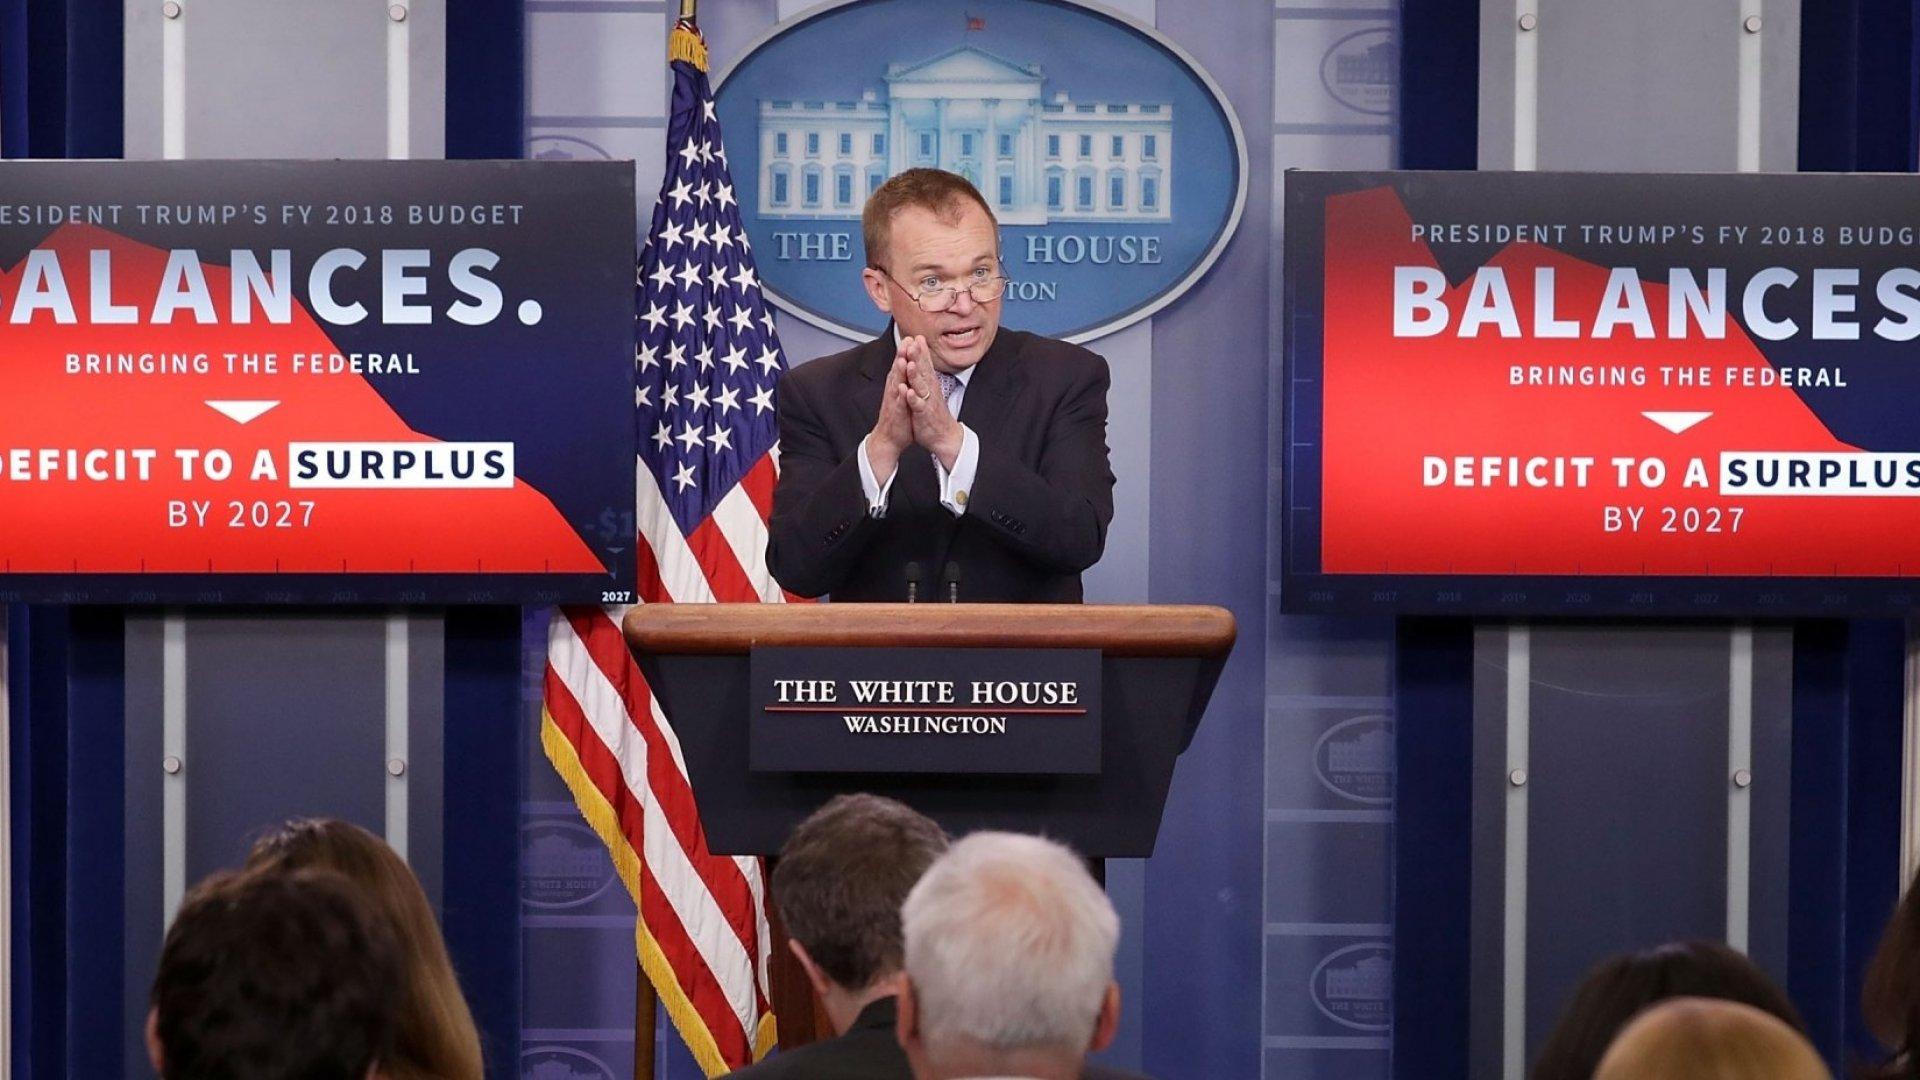 9 Key Takeaways From President Trump's $4.1 Trillion Budget Plan